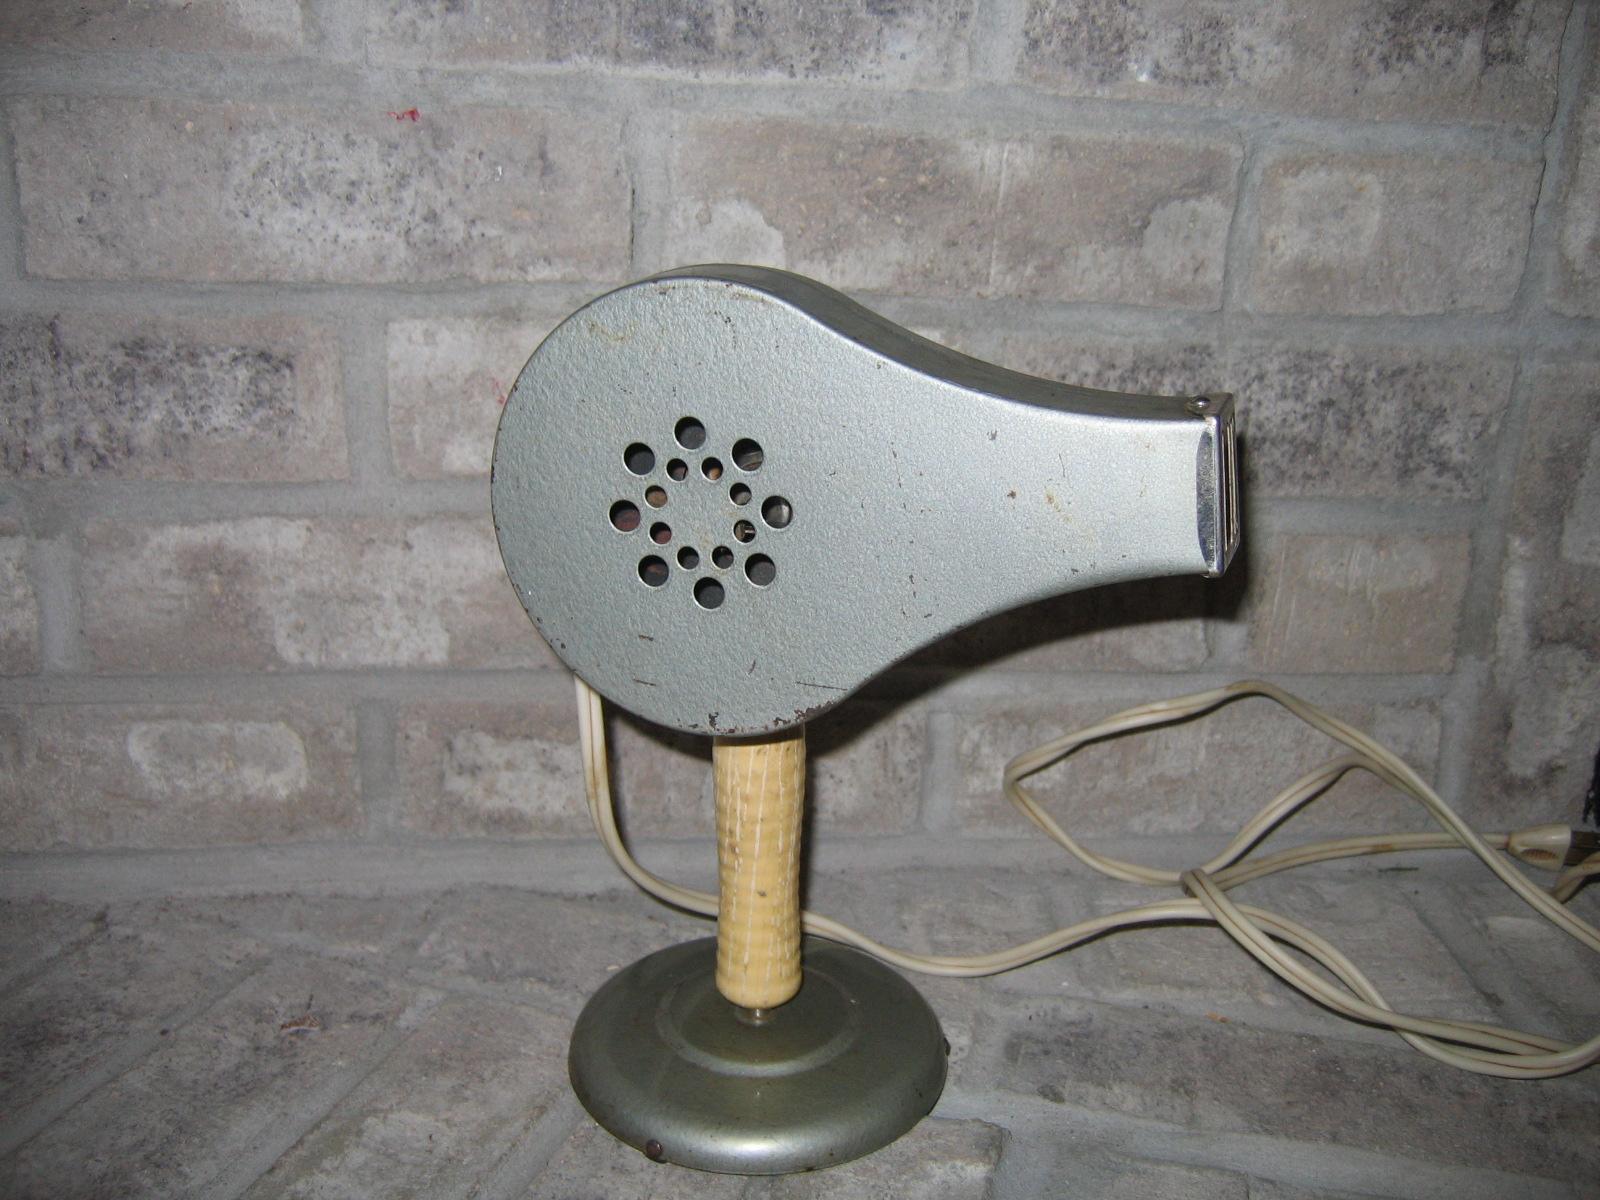 Old Vintage Chic Electric Metal Hair Dryer Item 830 For